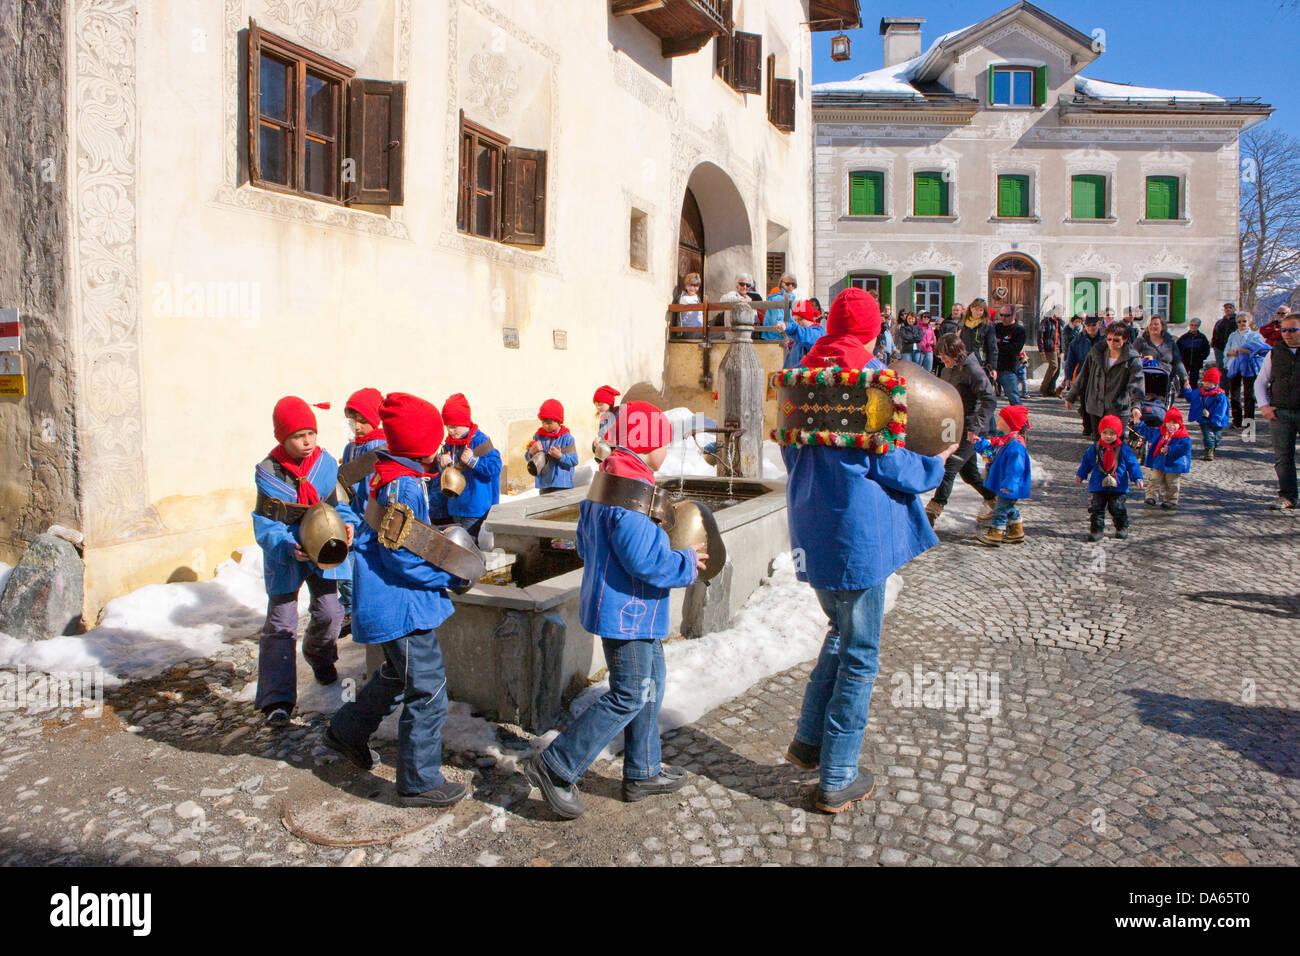 Chalandamarz, custom, Guarda, Unterengadin, tradition, folklore, national costumes, child, children, national costumes, - Stock Image